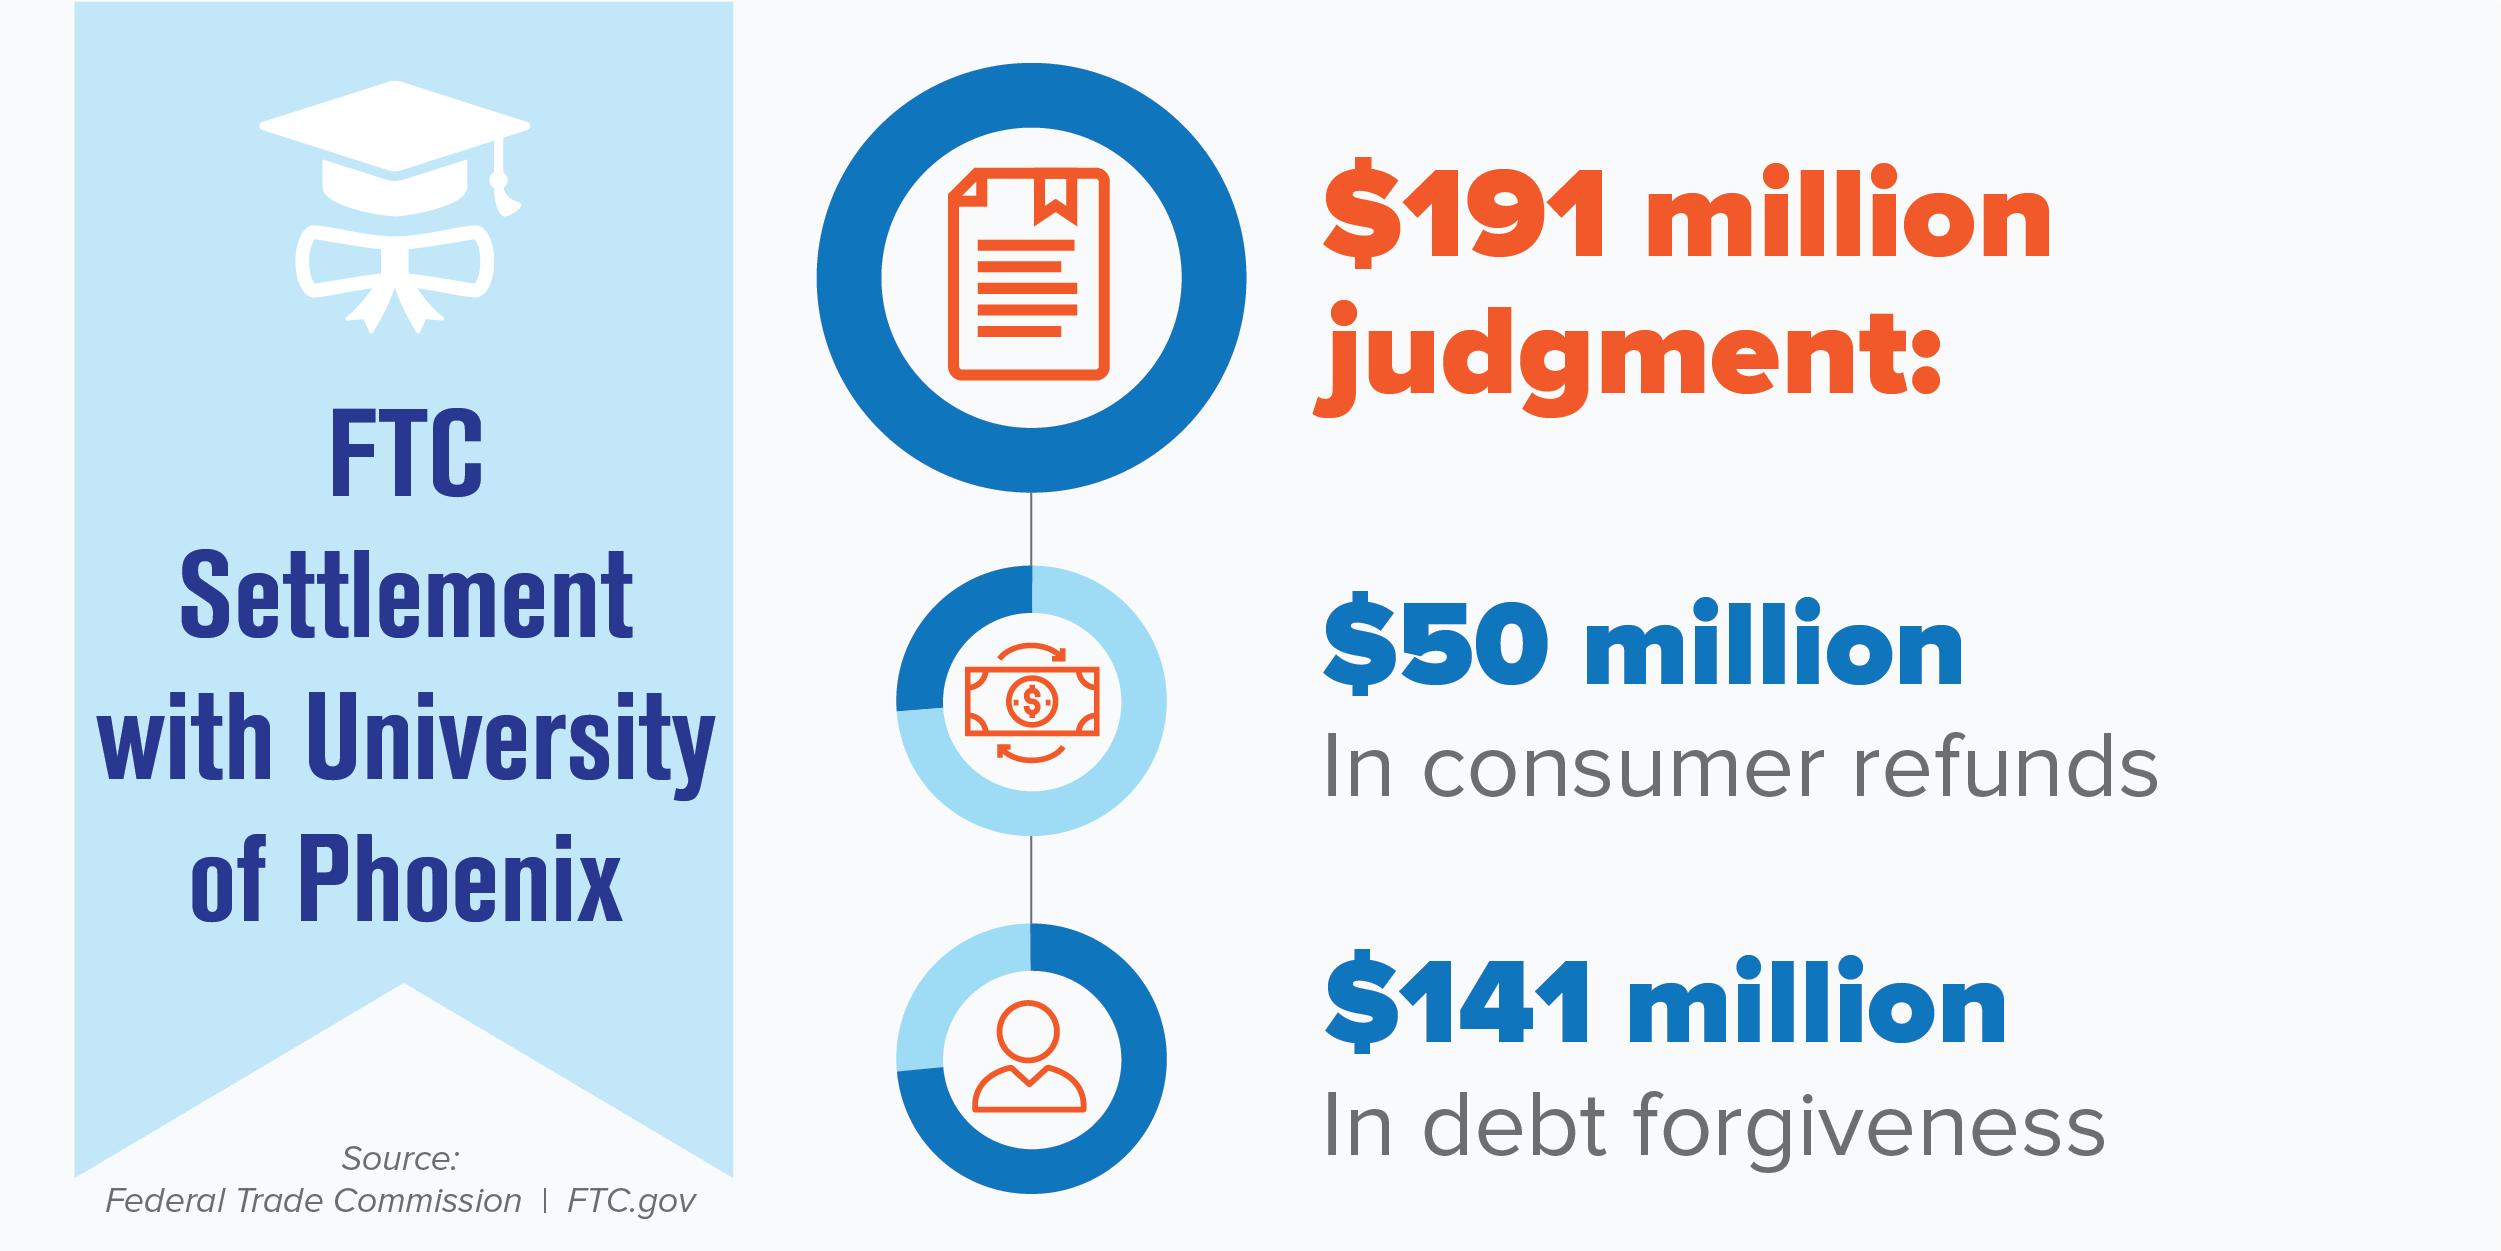 University of Phoenix settlement details: $191 million judgment; $50 million in consumer refunds; $141 million in debt forgiveness.